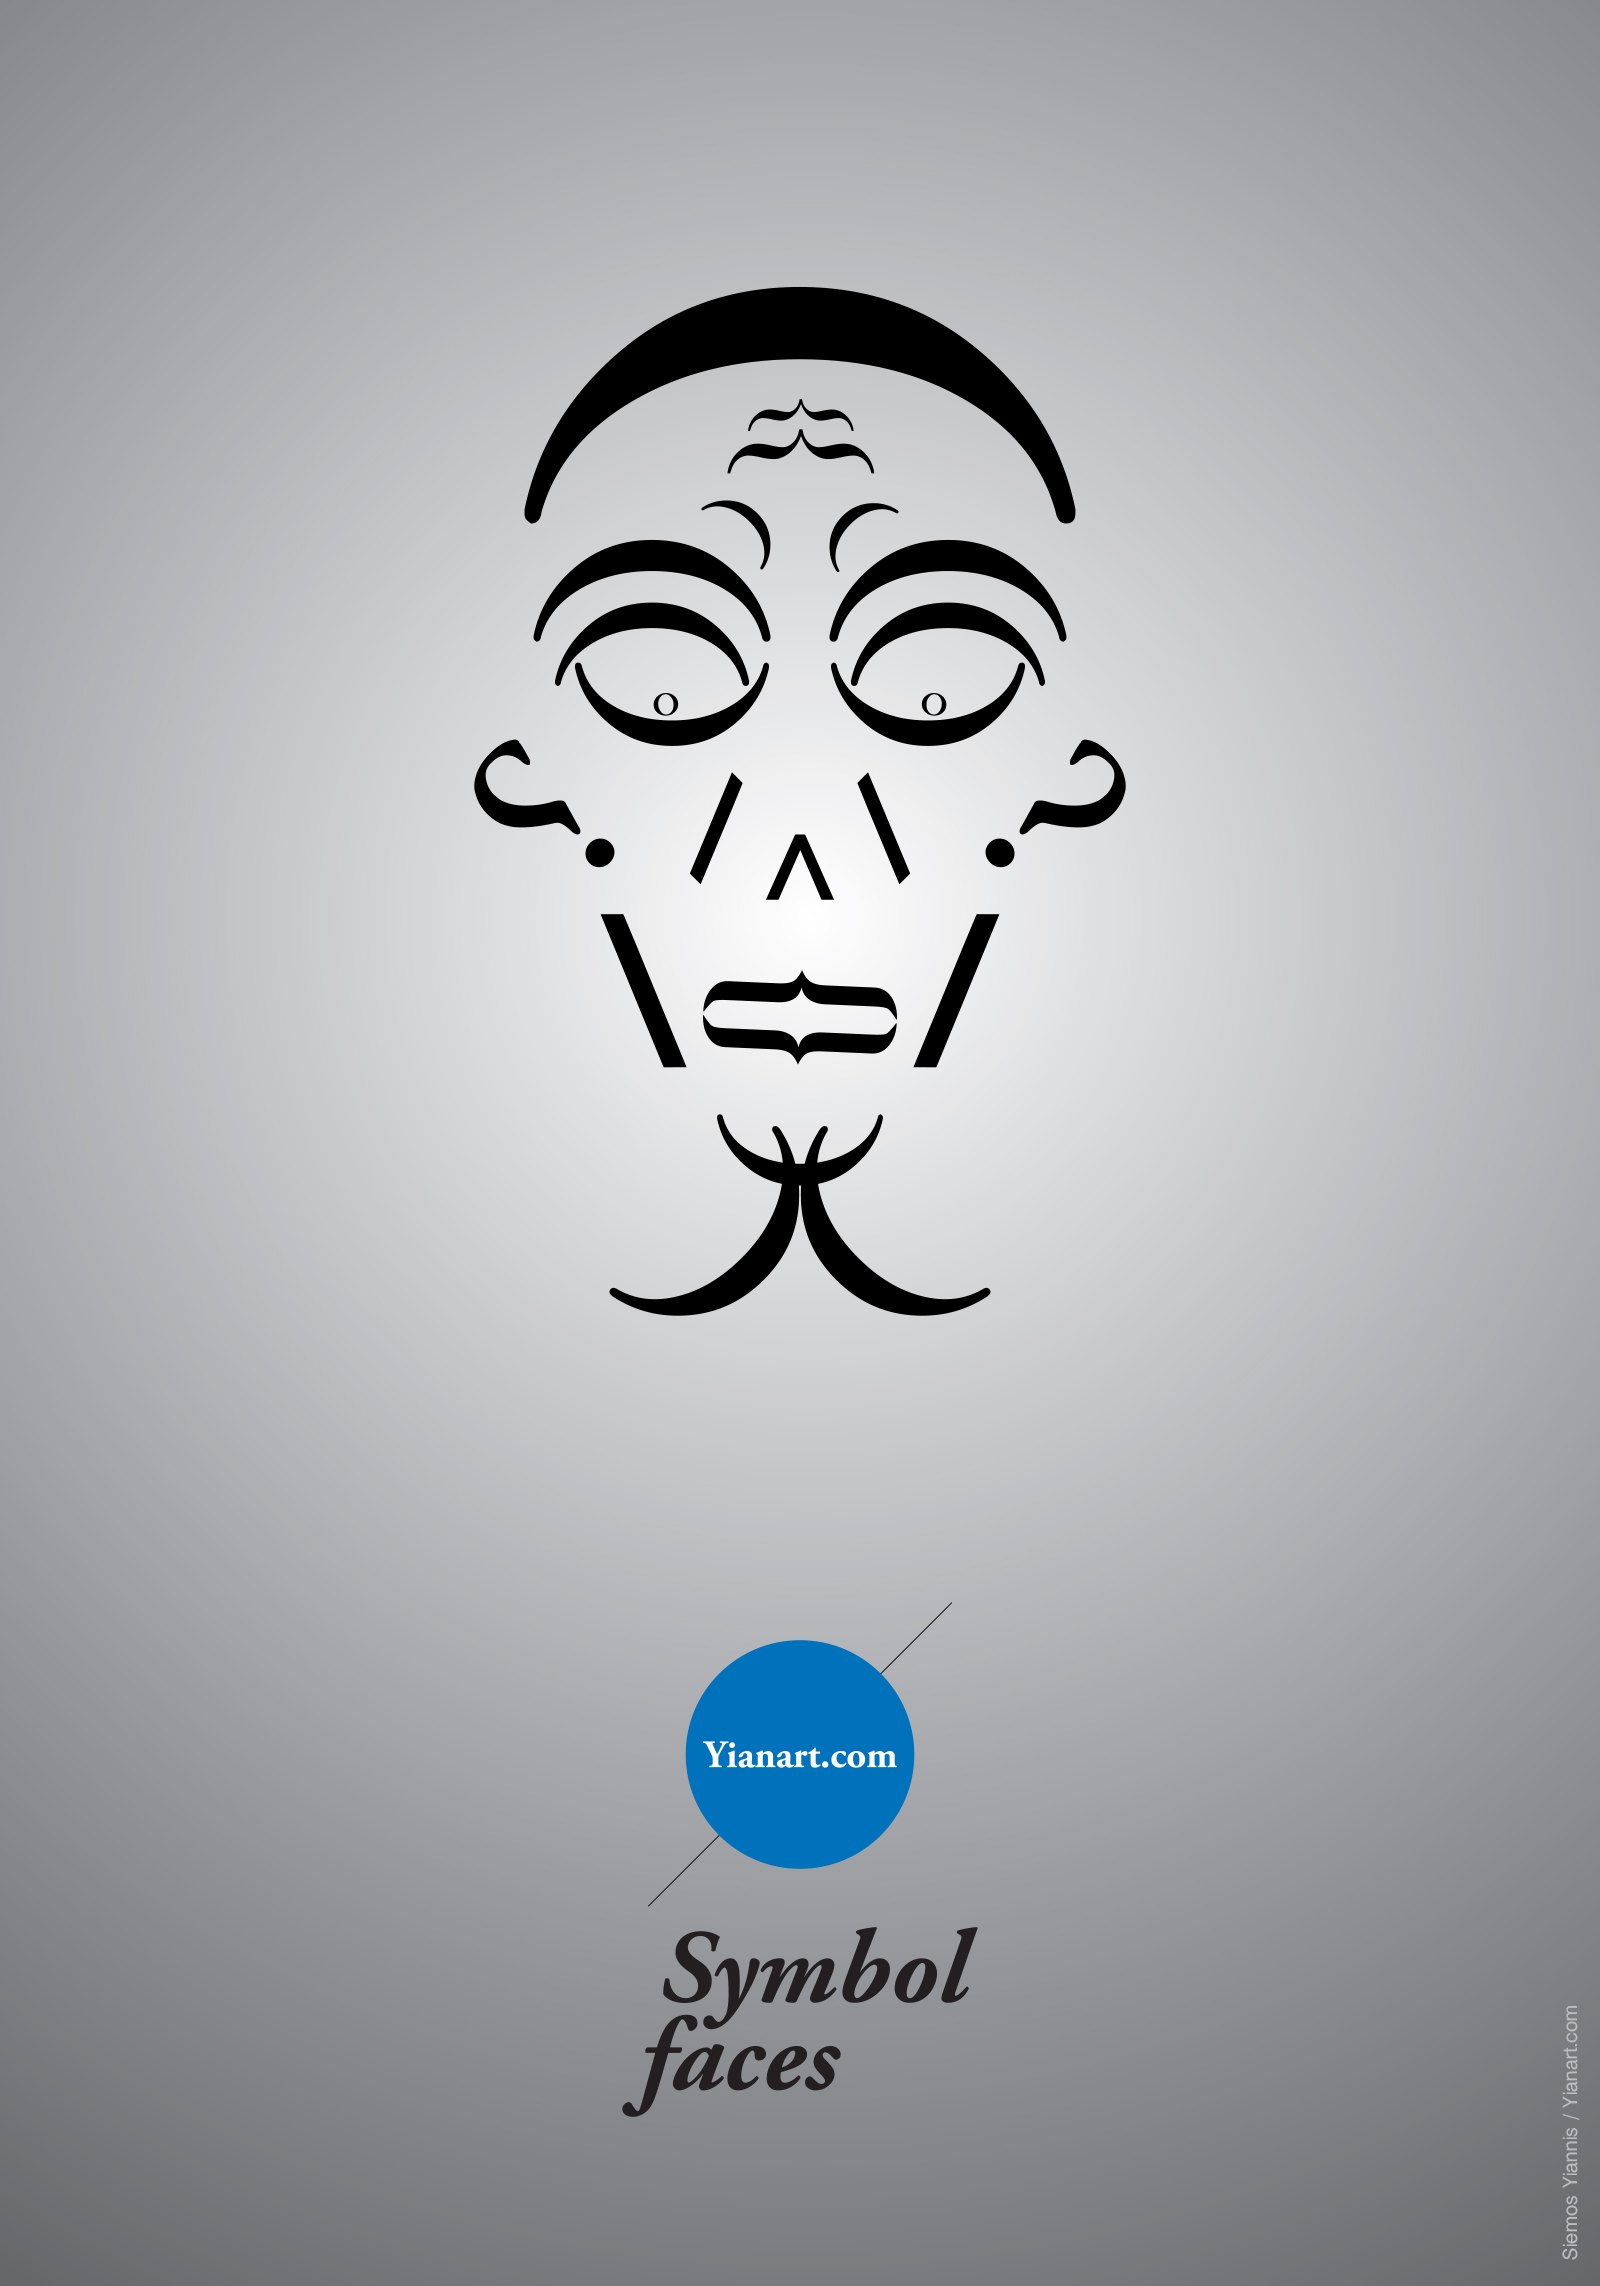 Symbol Faces_10_Yianart.com